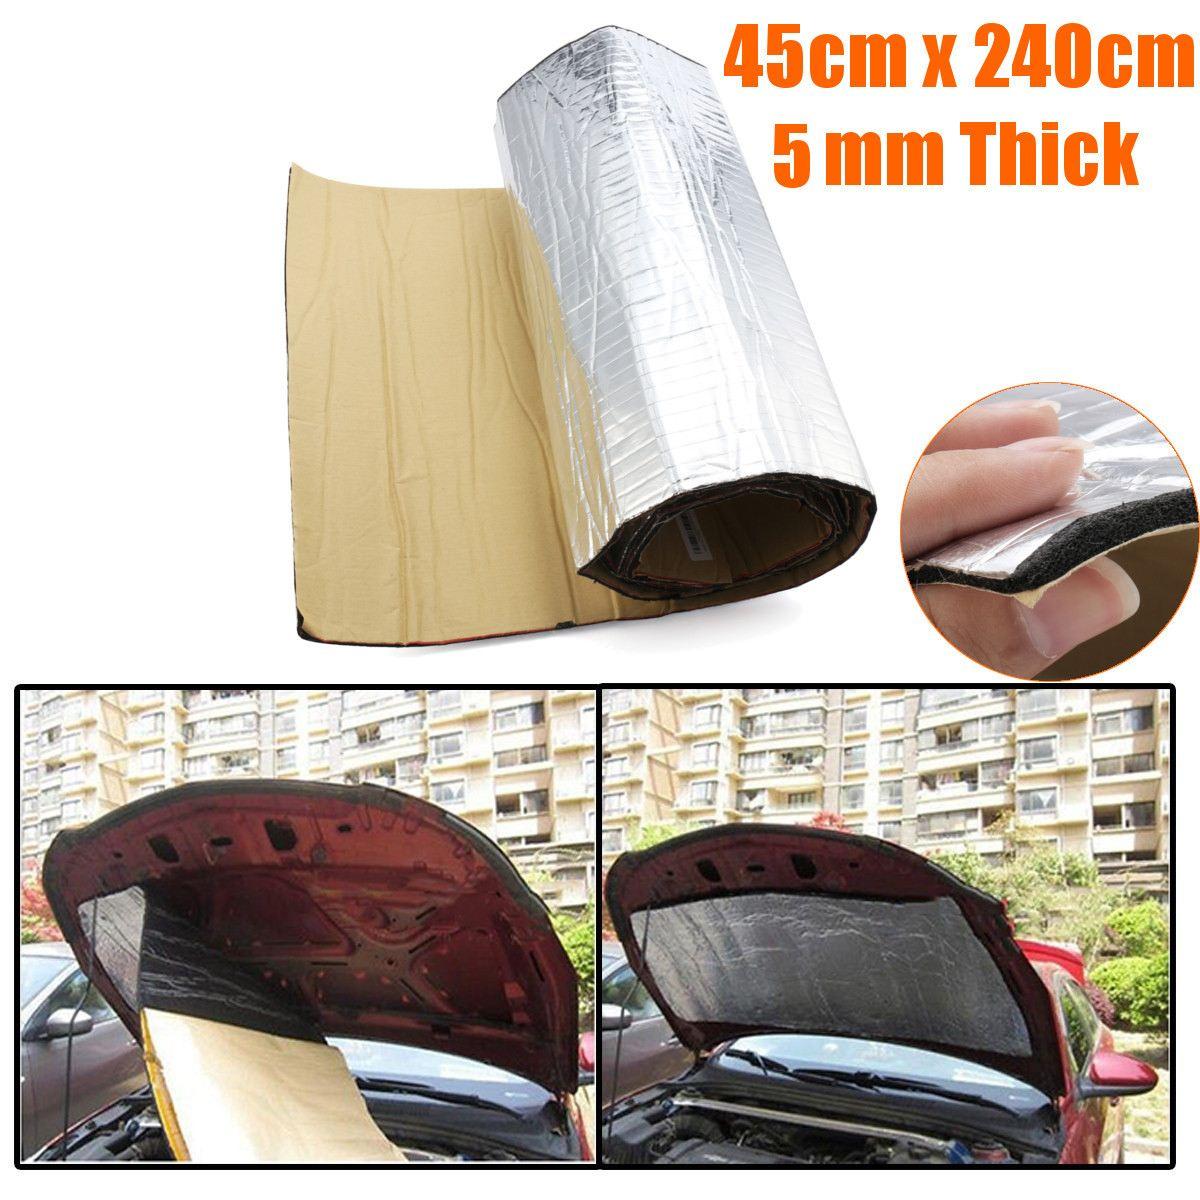 1Roll 240cmx50cm Car Sound Proofing Deadening Anti noise Sound Insulation Cotton Heat Closed Cell Foam Interior Accessories|Sound & Heat Insulation Cotton| |  - title=